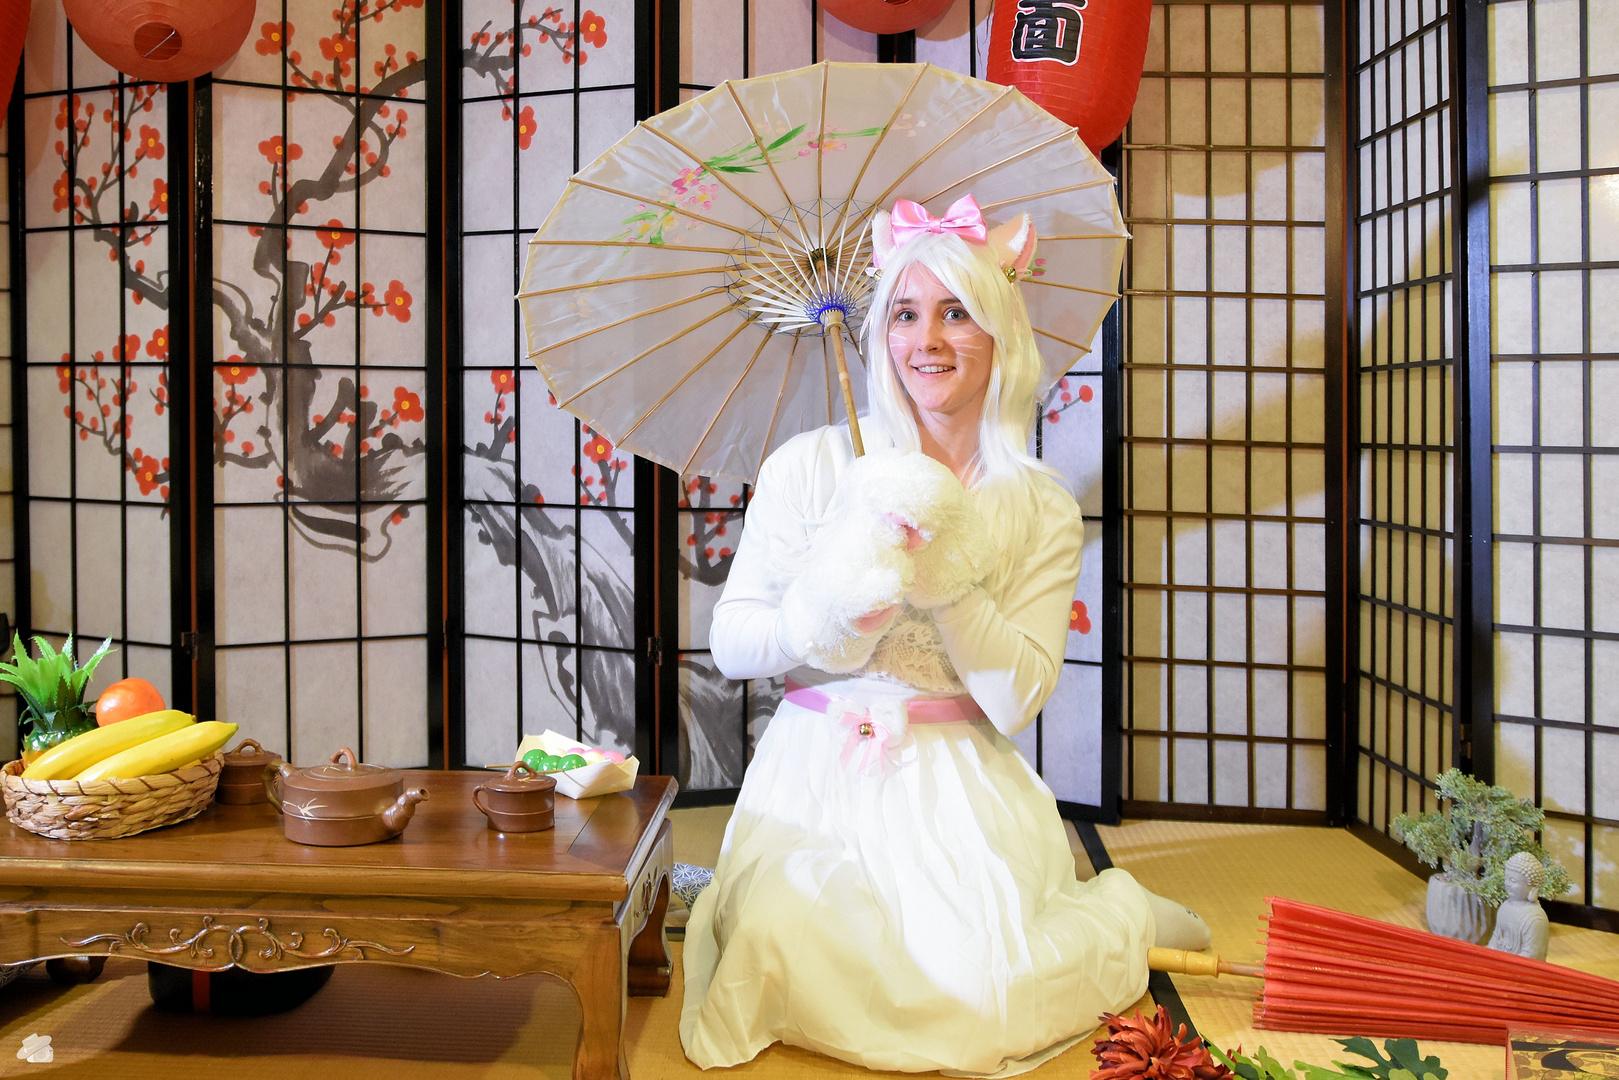 Japan Miezi